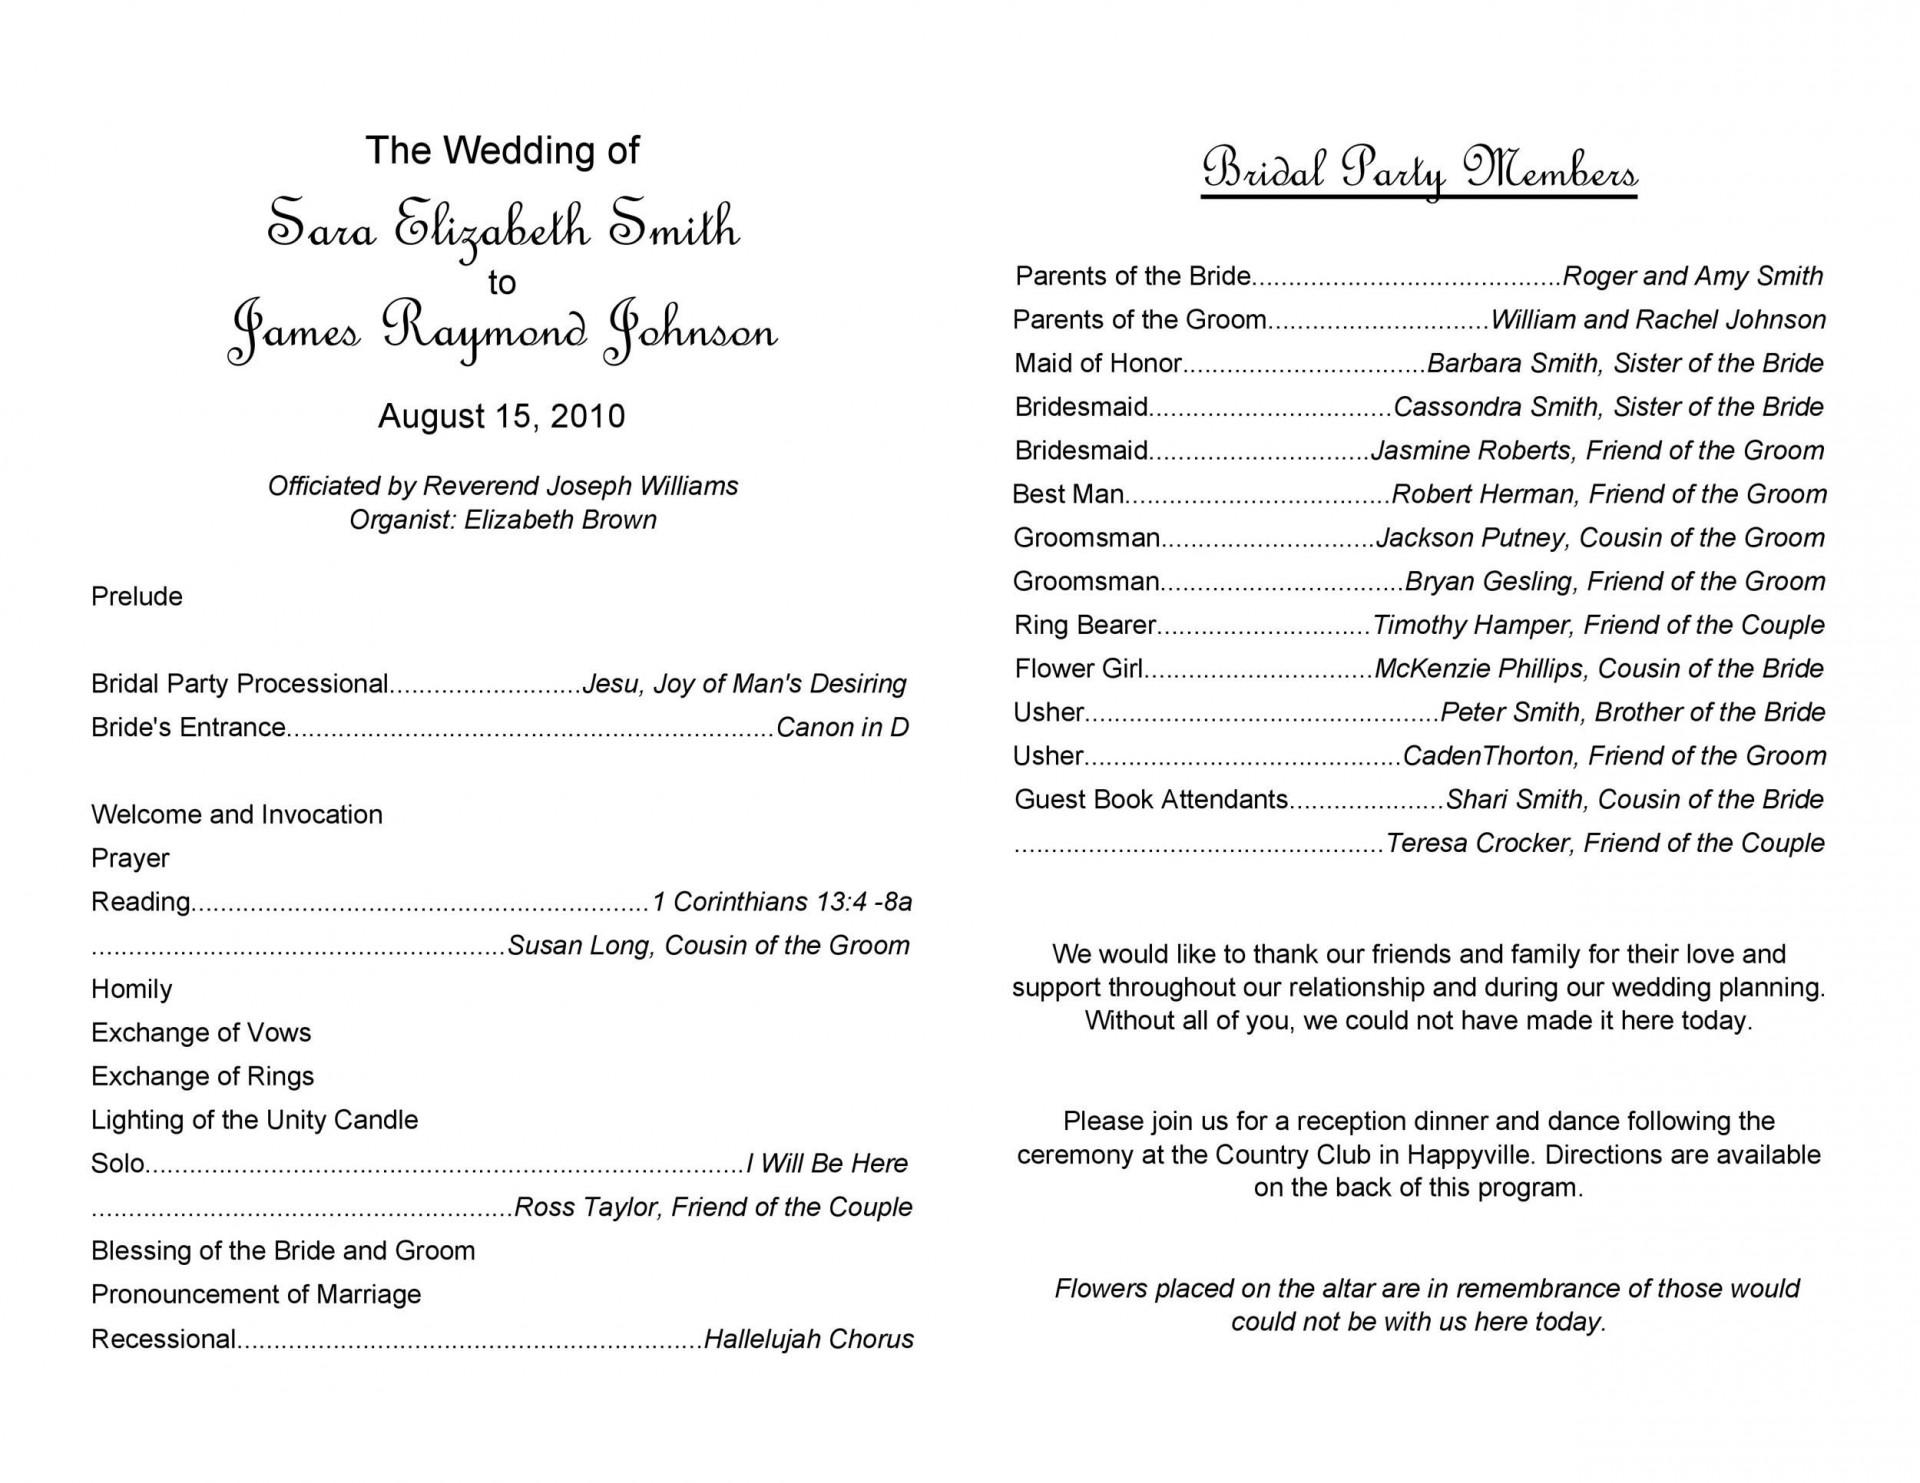 009 Rare Free Download Template For Wedding Program High Resolution  Programs1920